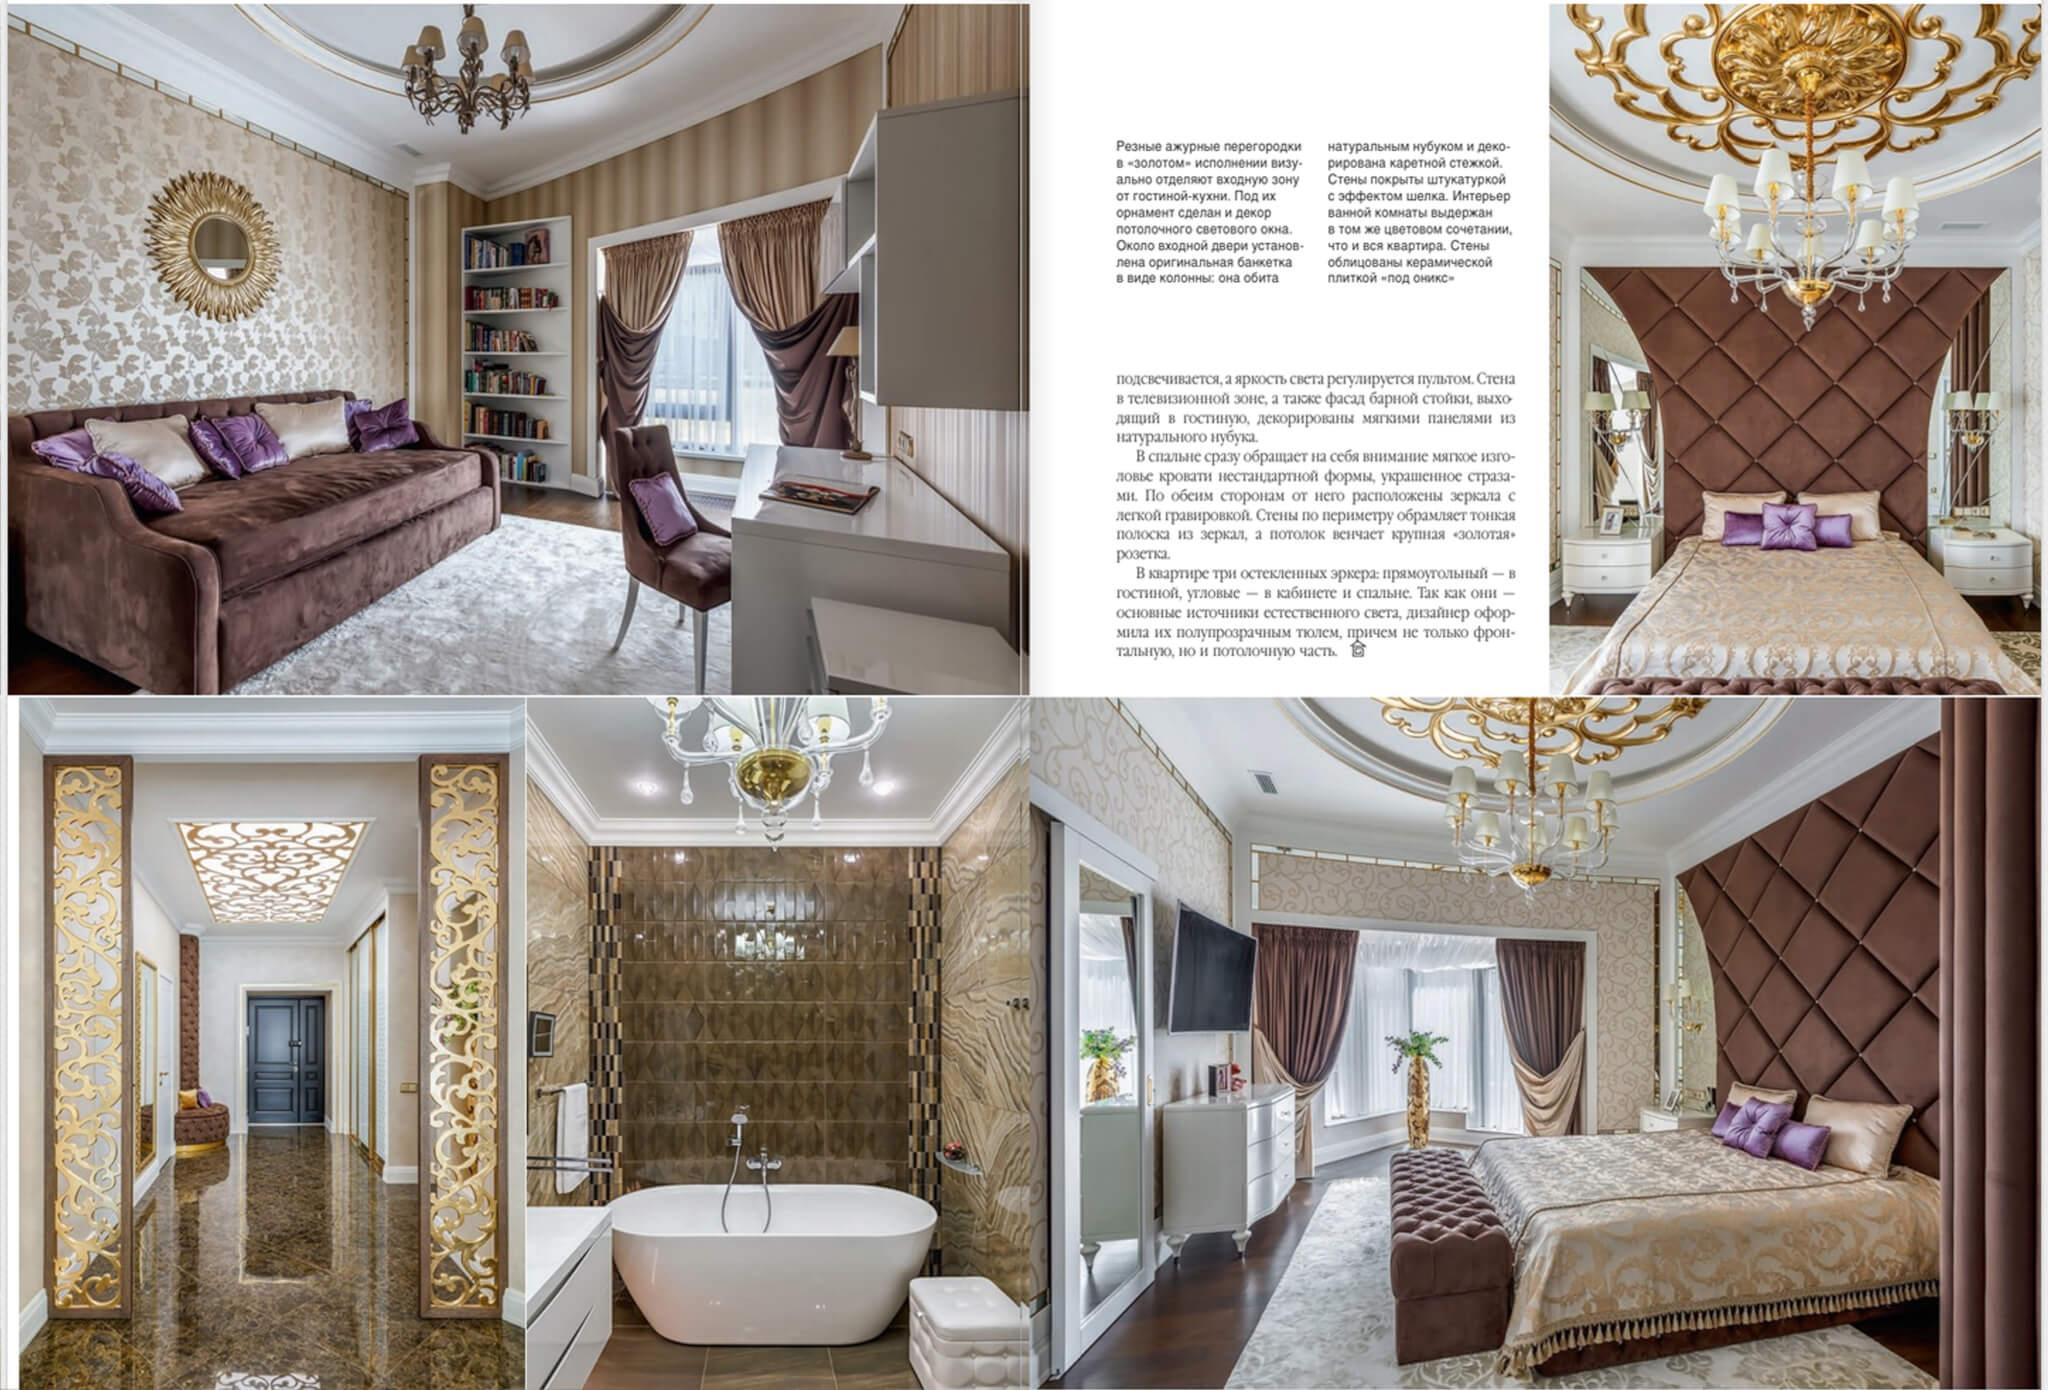 Надежда Резцова в журнале Красивые квартиры